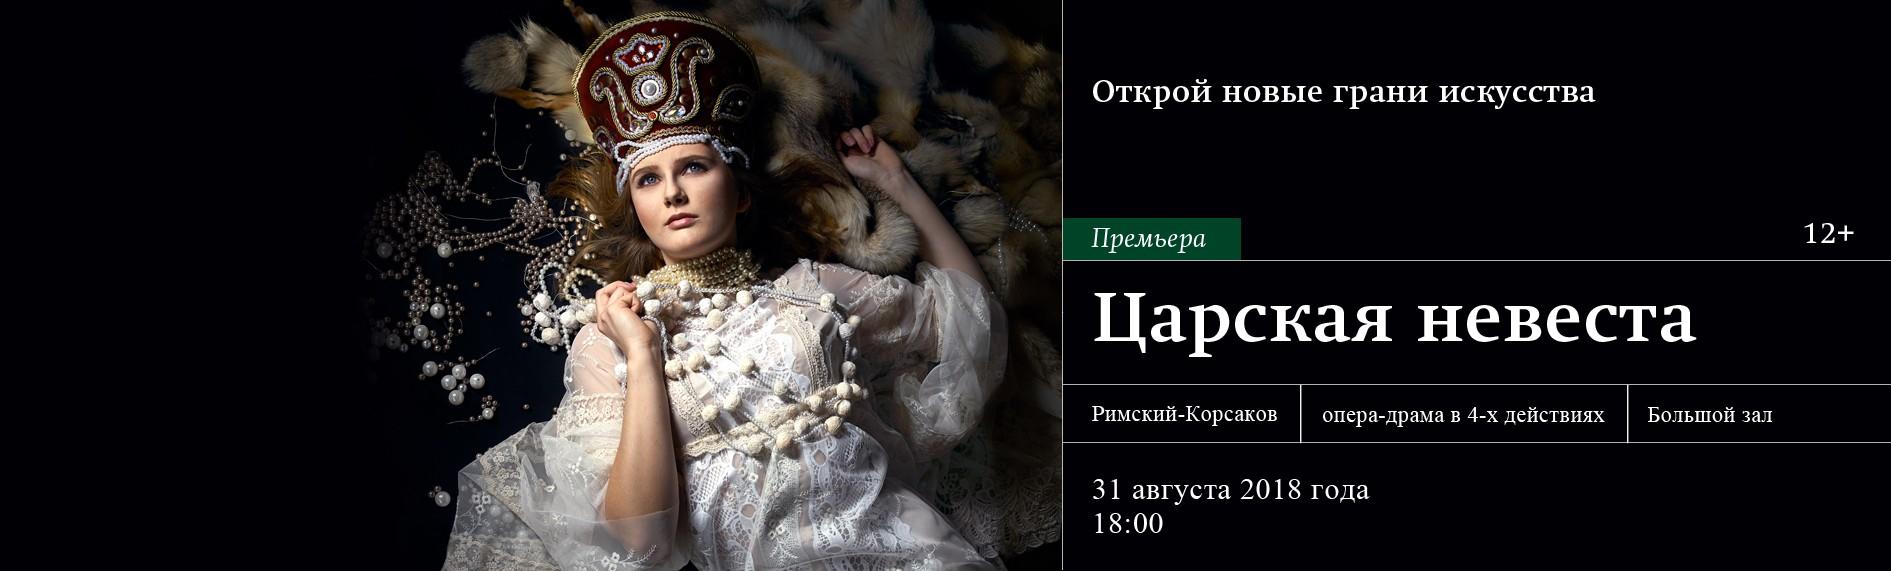 "Премьера оперы ""Царская невеста"" август"